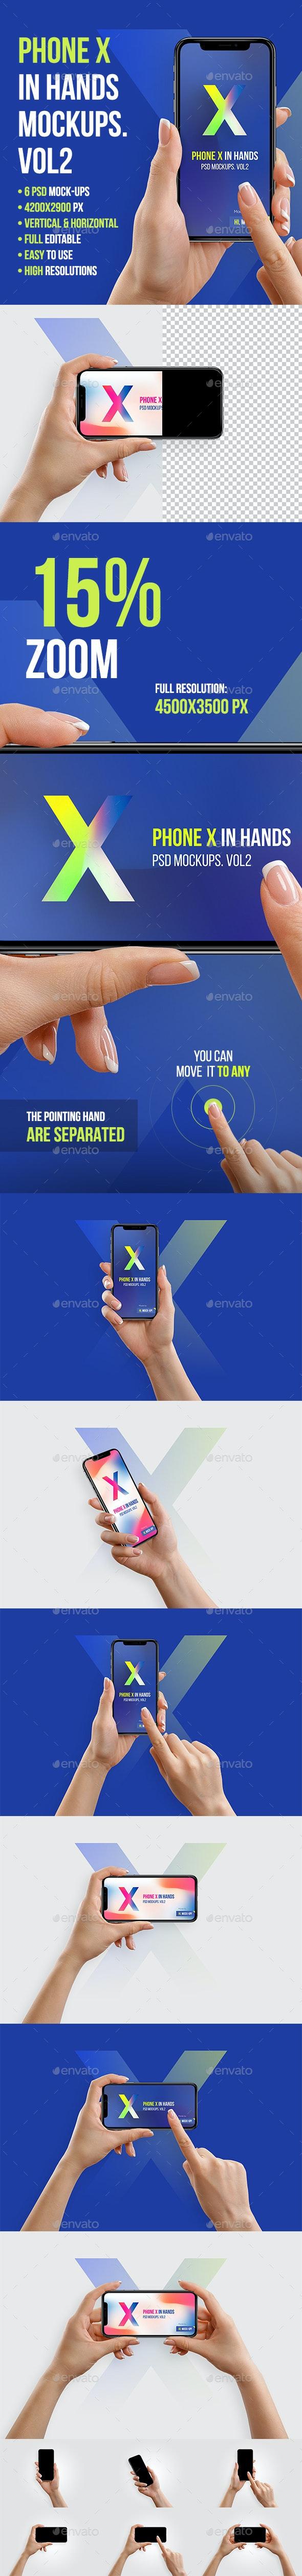 Phone X in Hands Mockups Vol2 - Mobile Displays